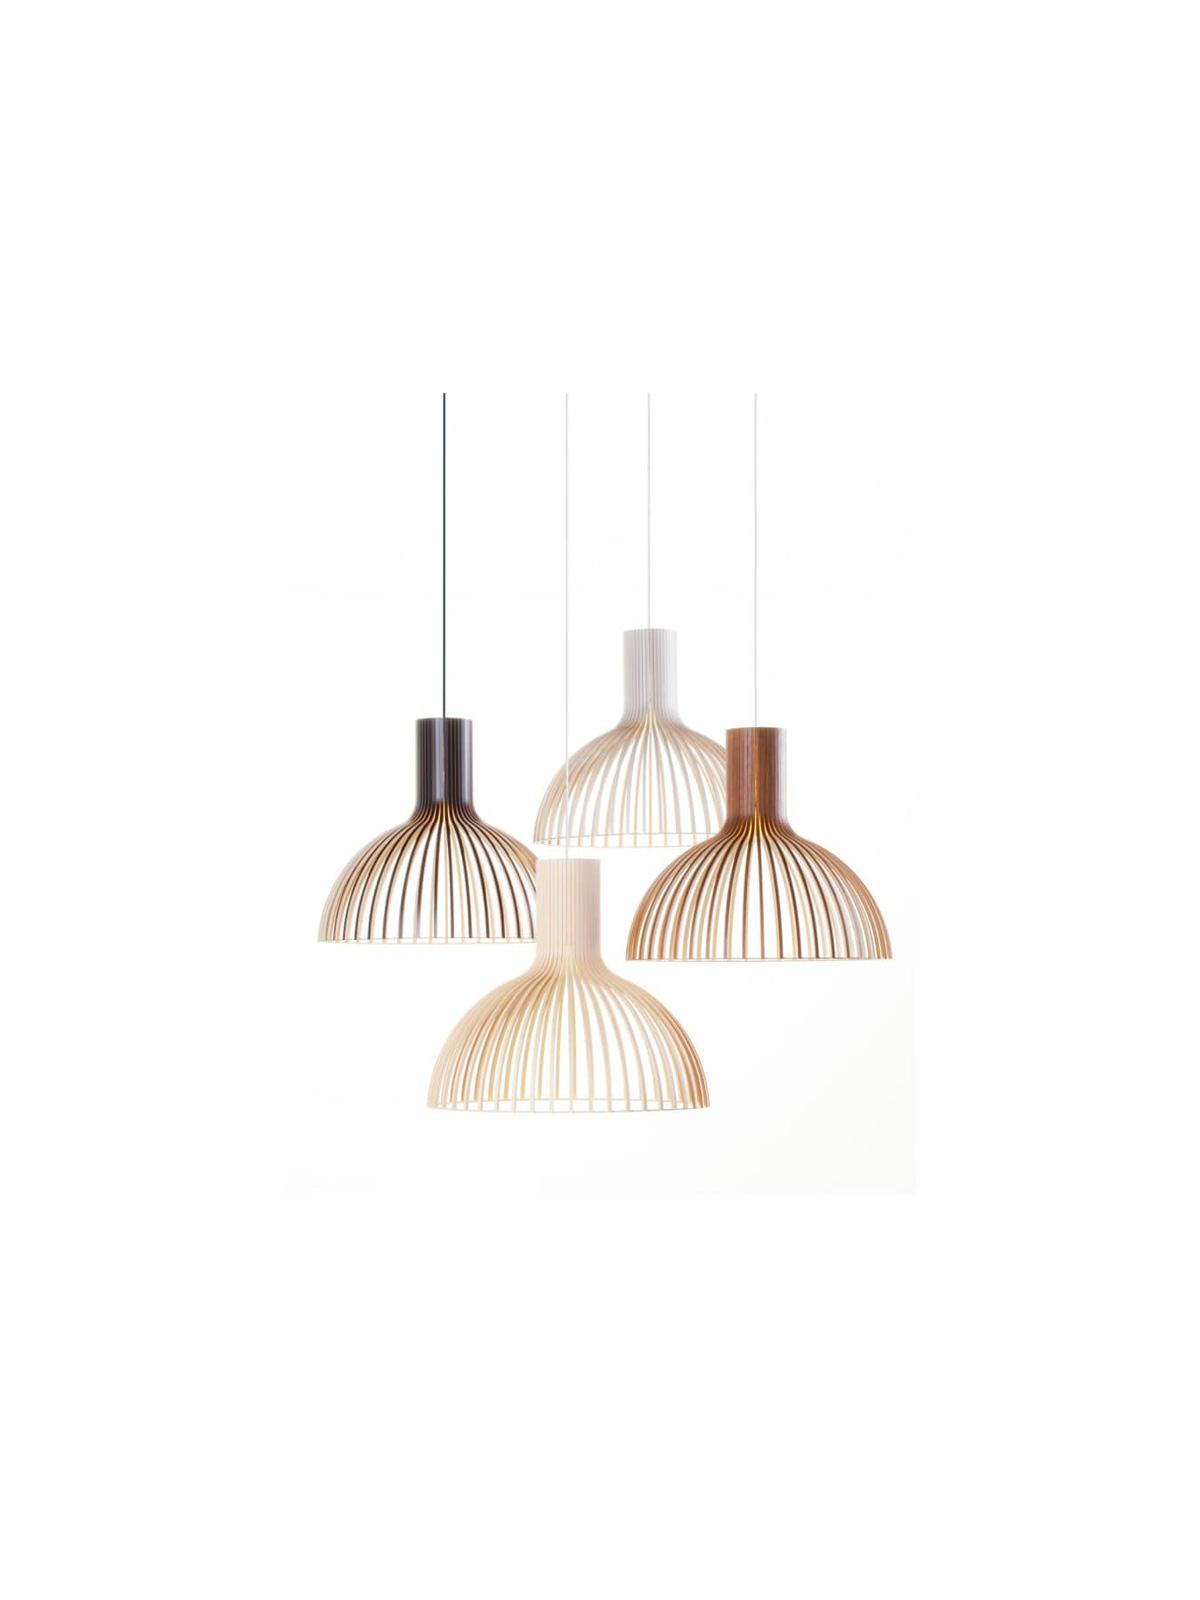 Victo Small Secto Design DesignOrt Onlineshop Lampen Berlin